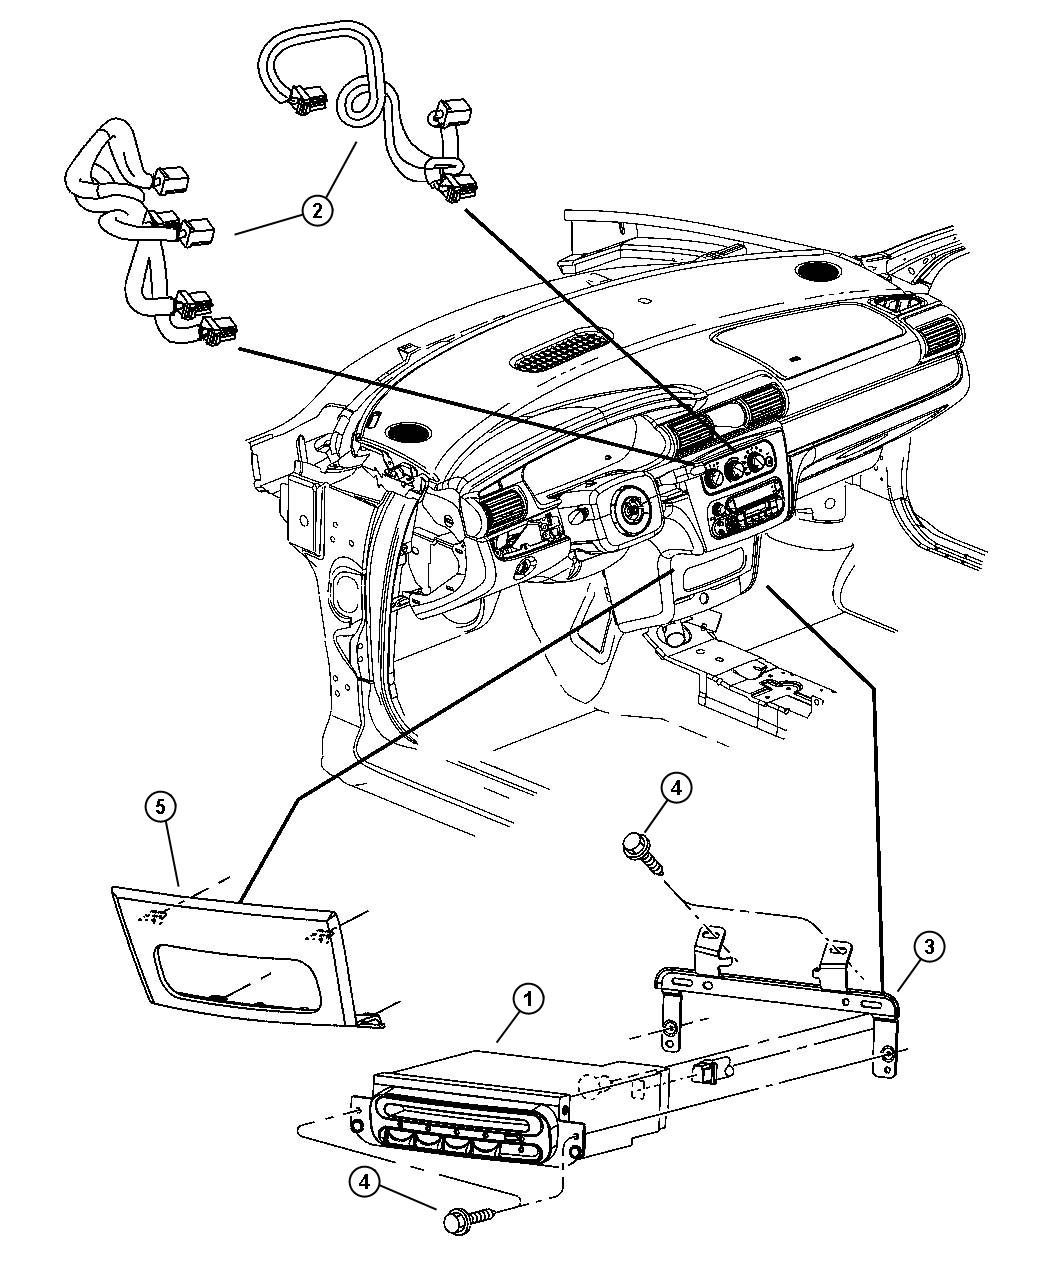 Chrysler Sebring Wiring Compact Disc Changer